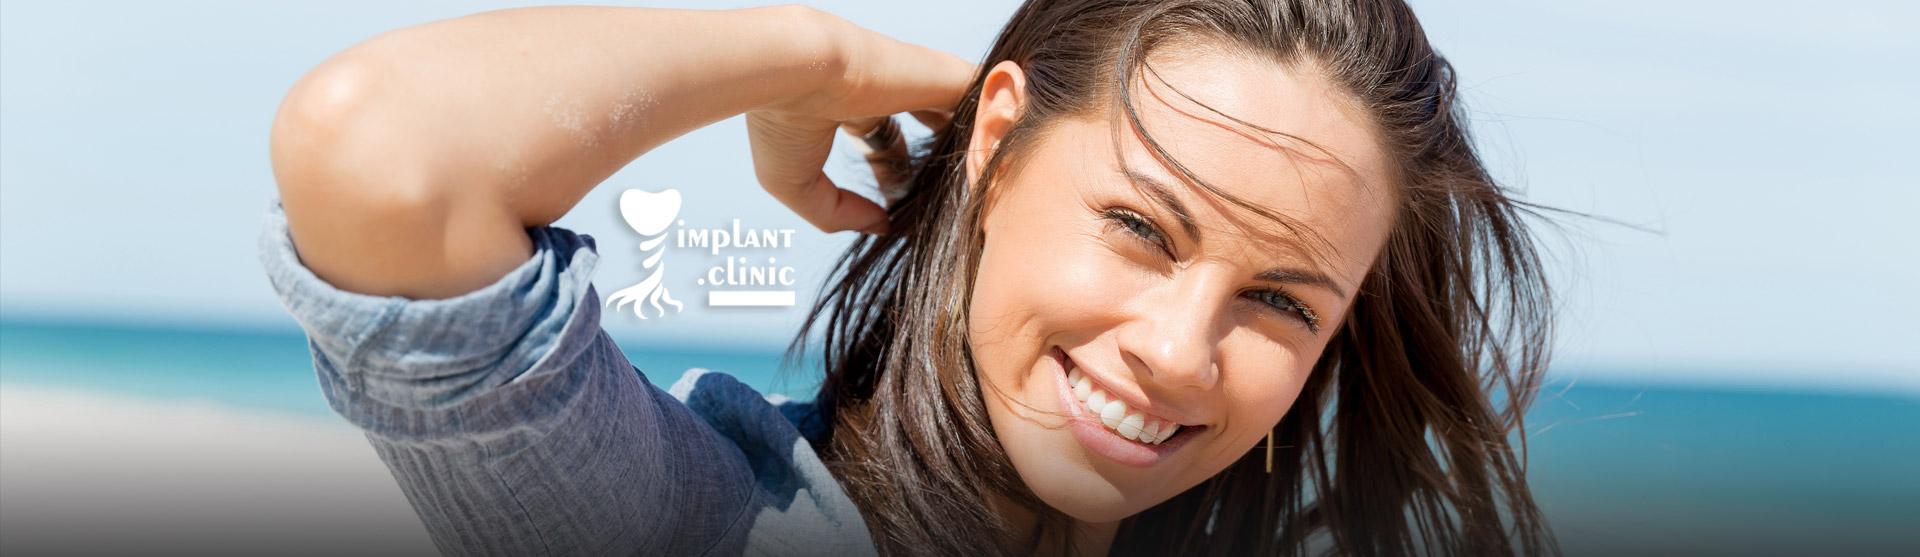 implant-clinic-header-bg